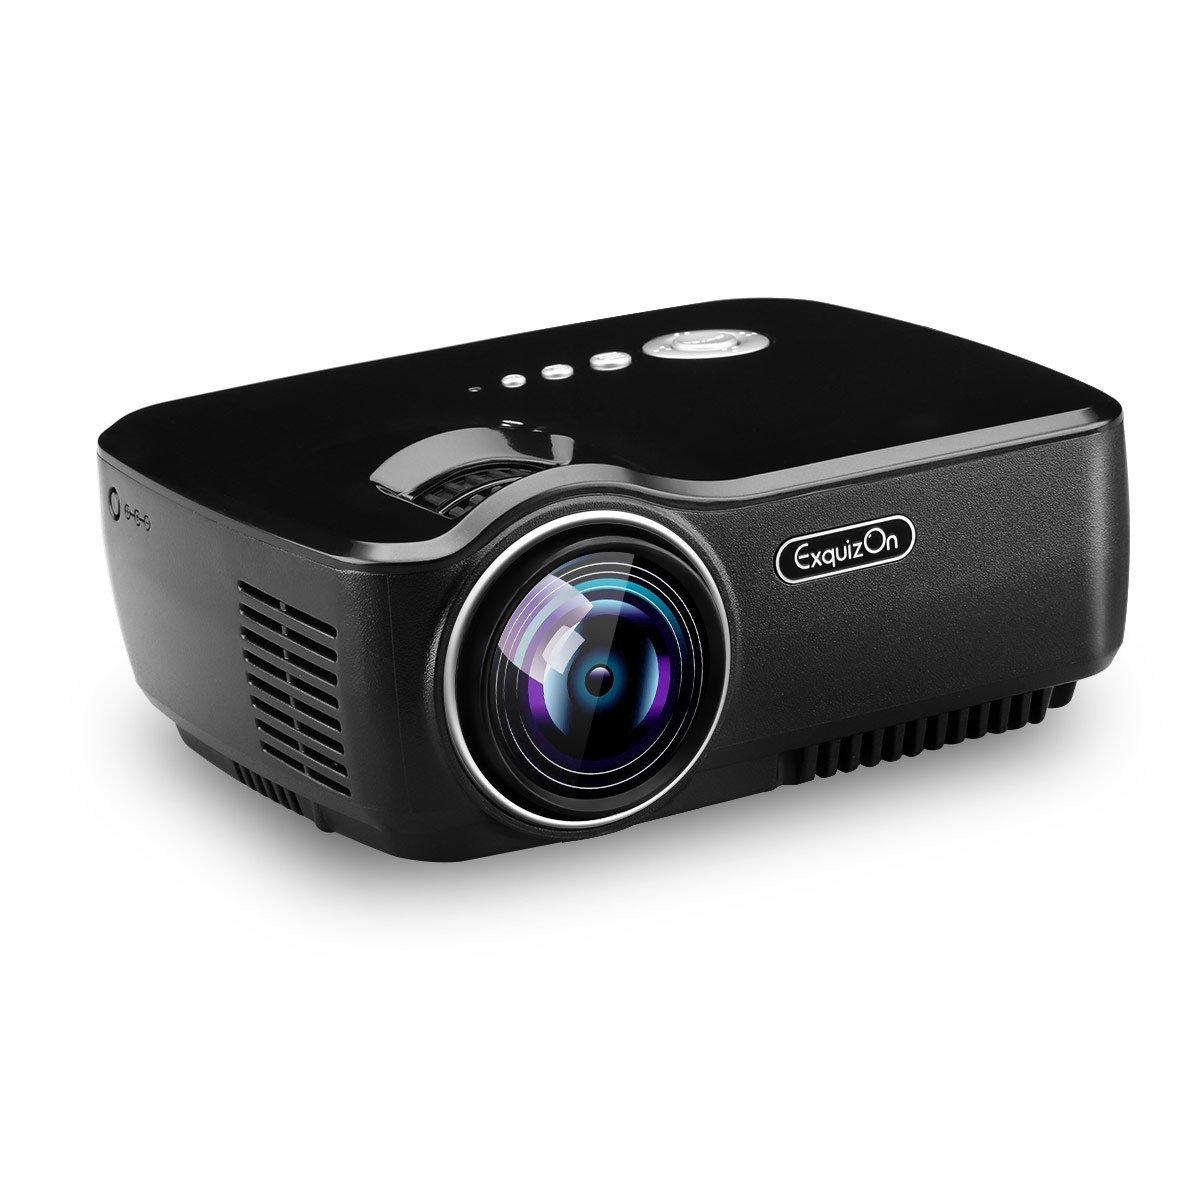 Exquizon GP70 - Proyector portátil LCD Videoproyector doméstico ...